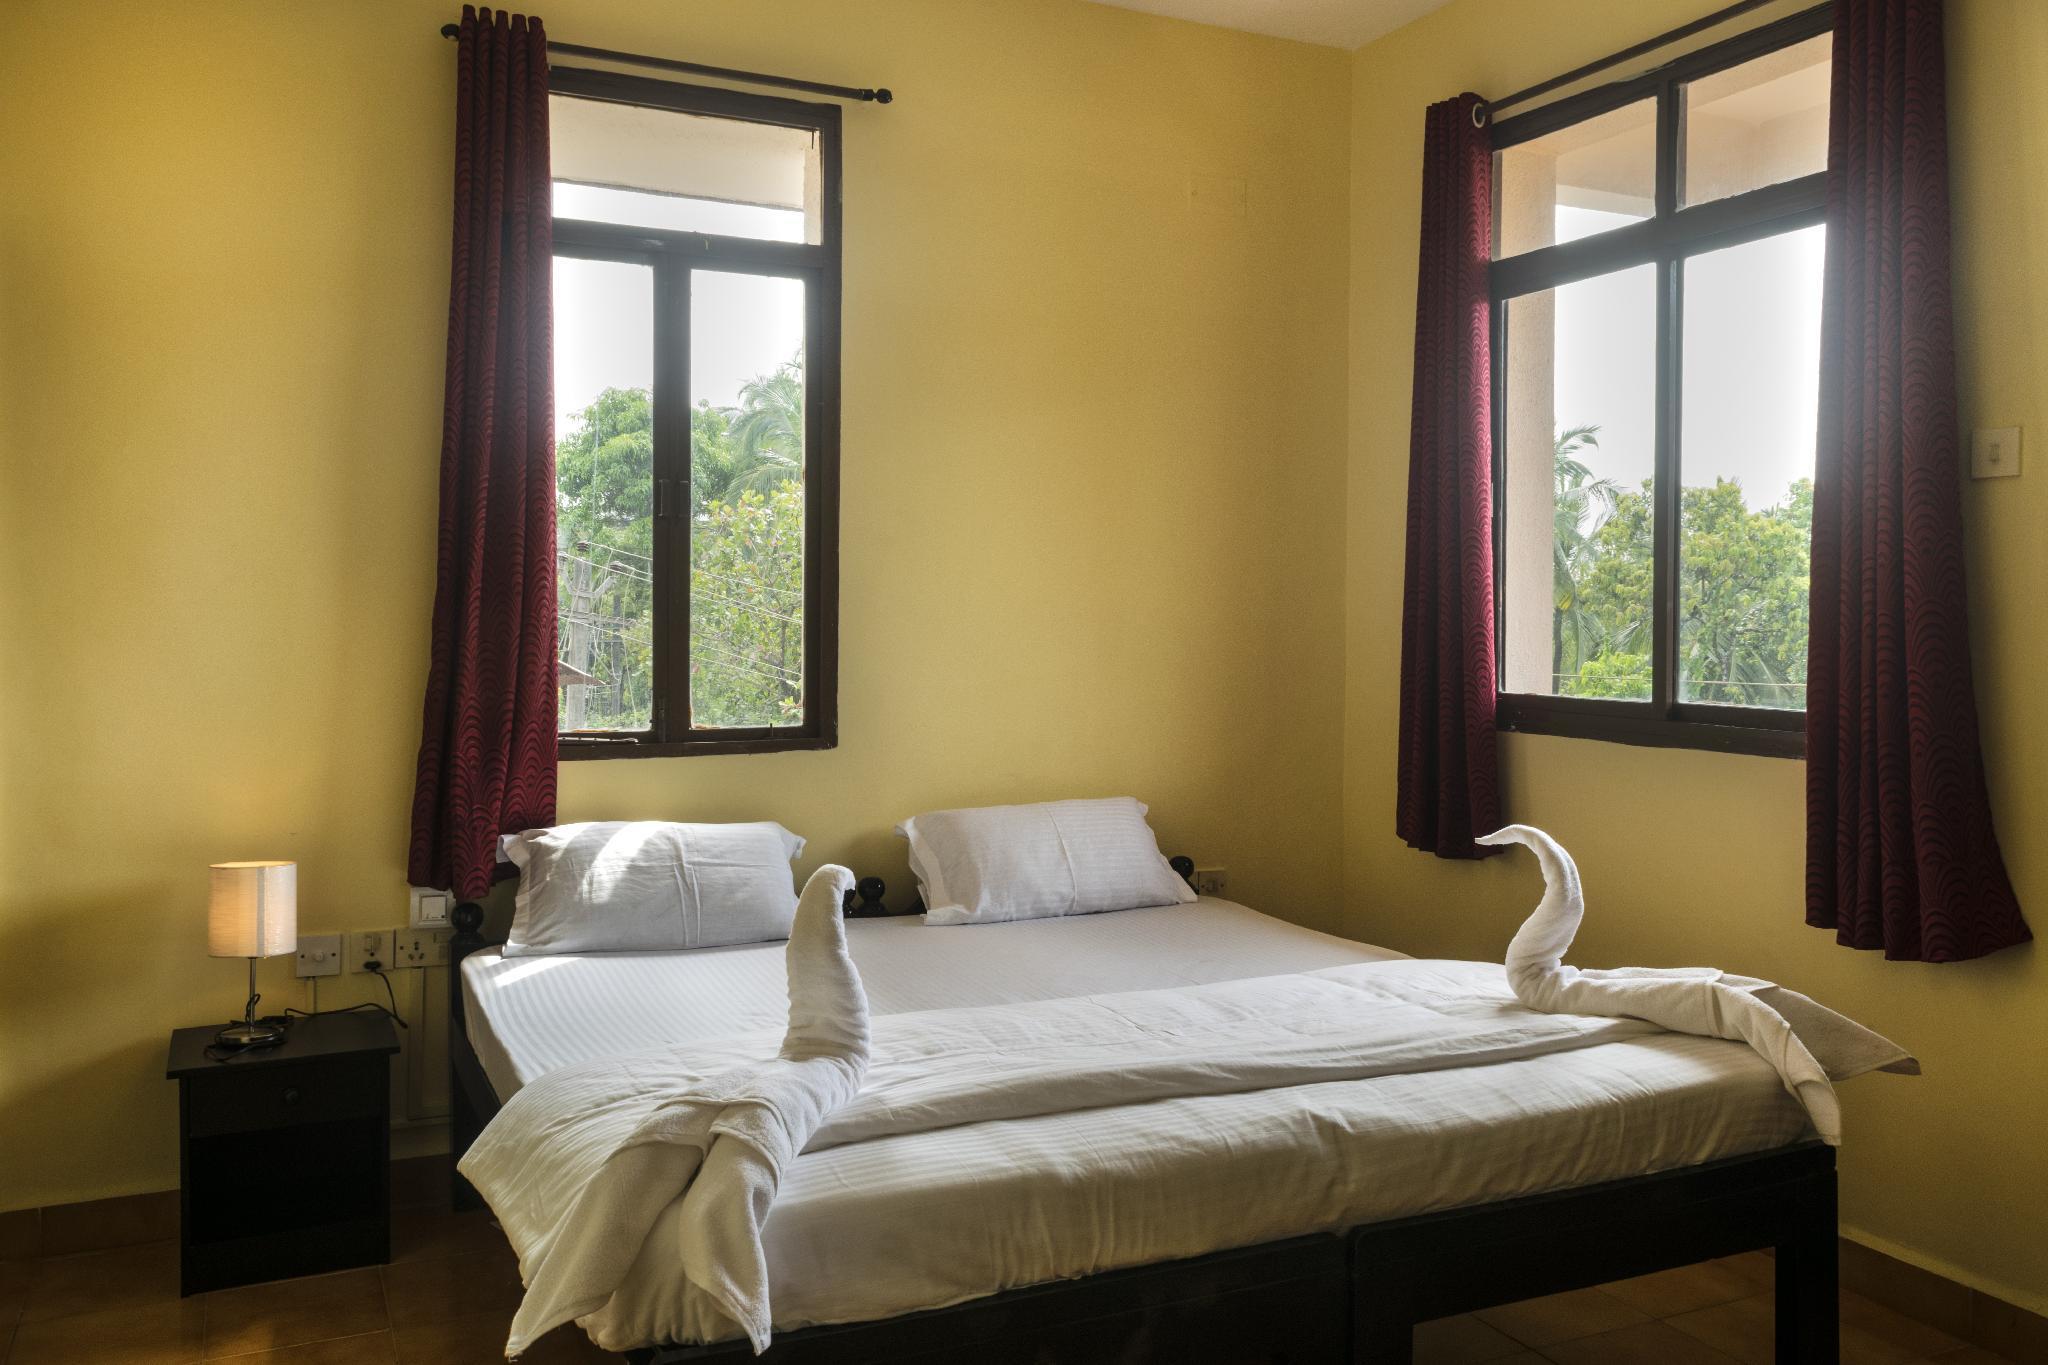 Sea View Holidays Apartment